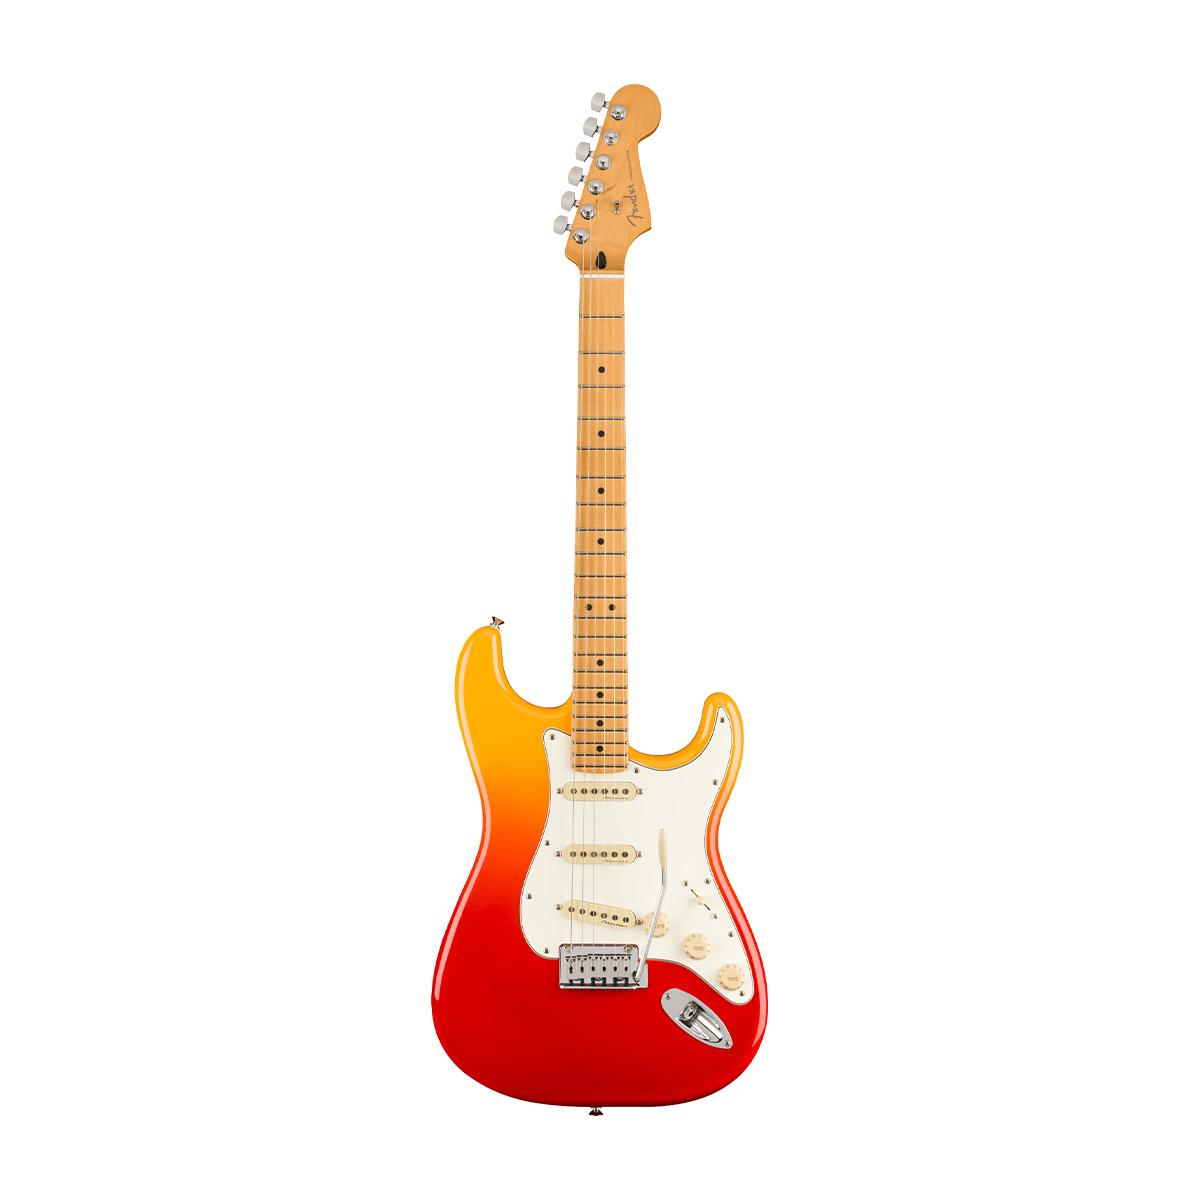 Fender / Player Plus Stratocaster Maple Fingerboard Tequila Sunrise